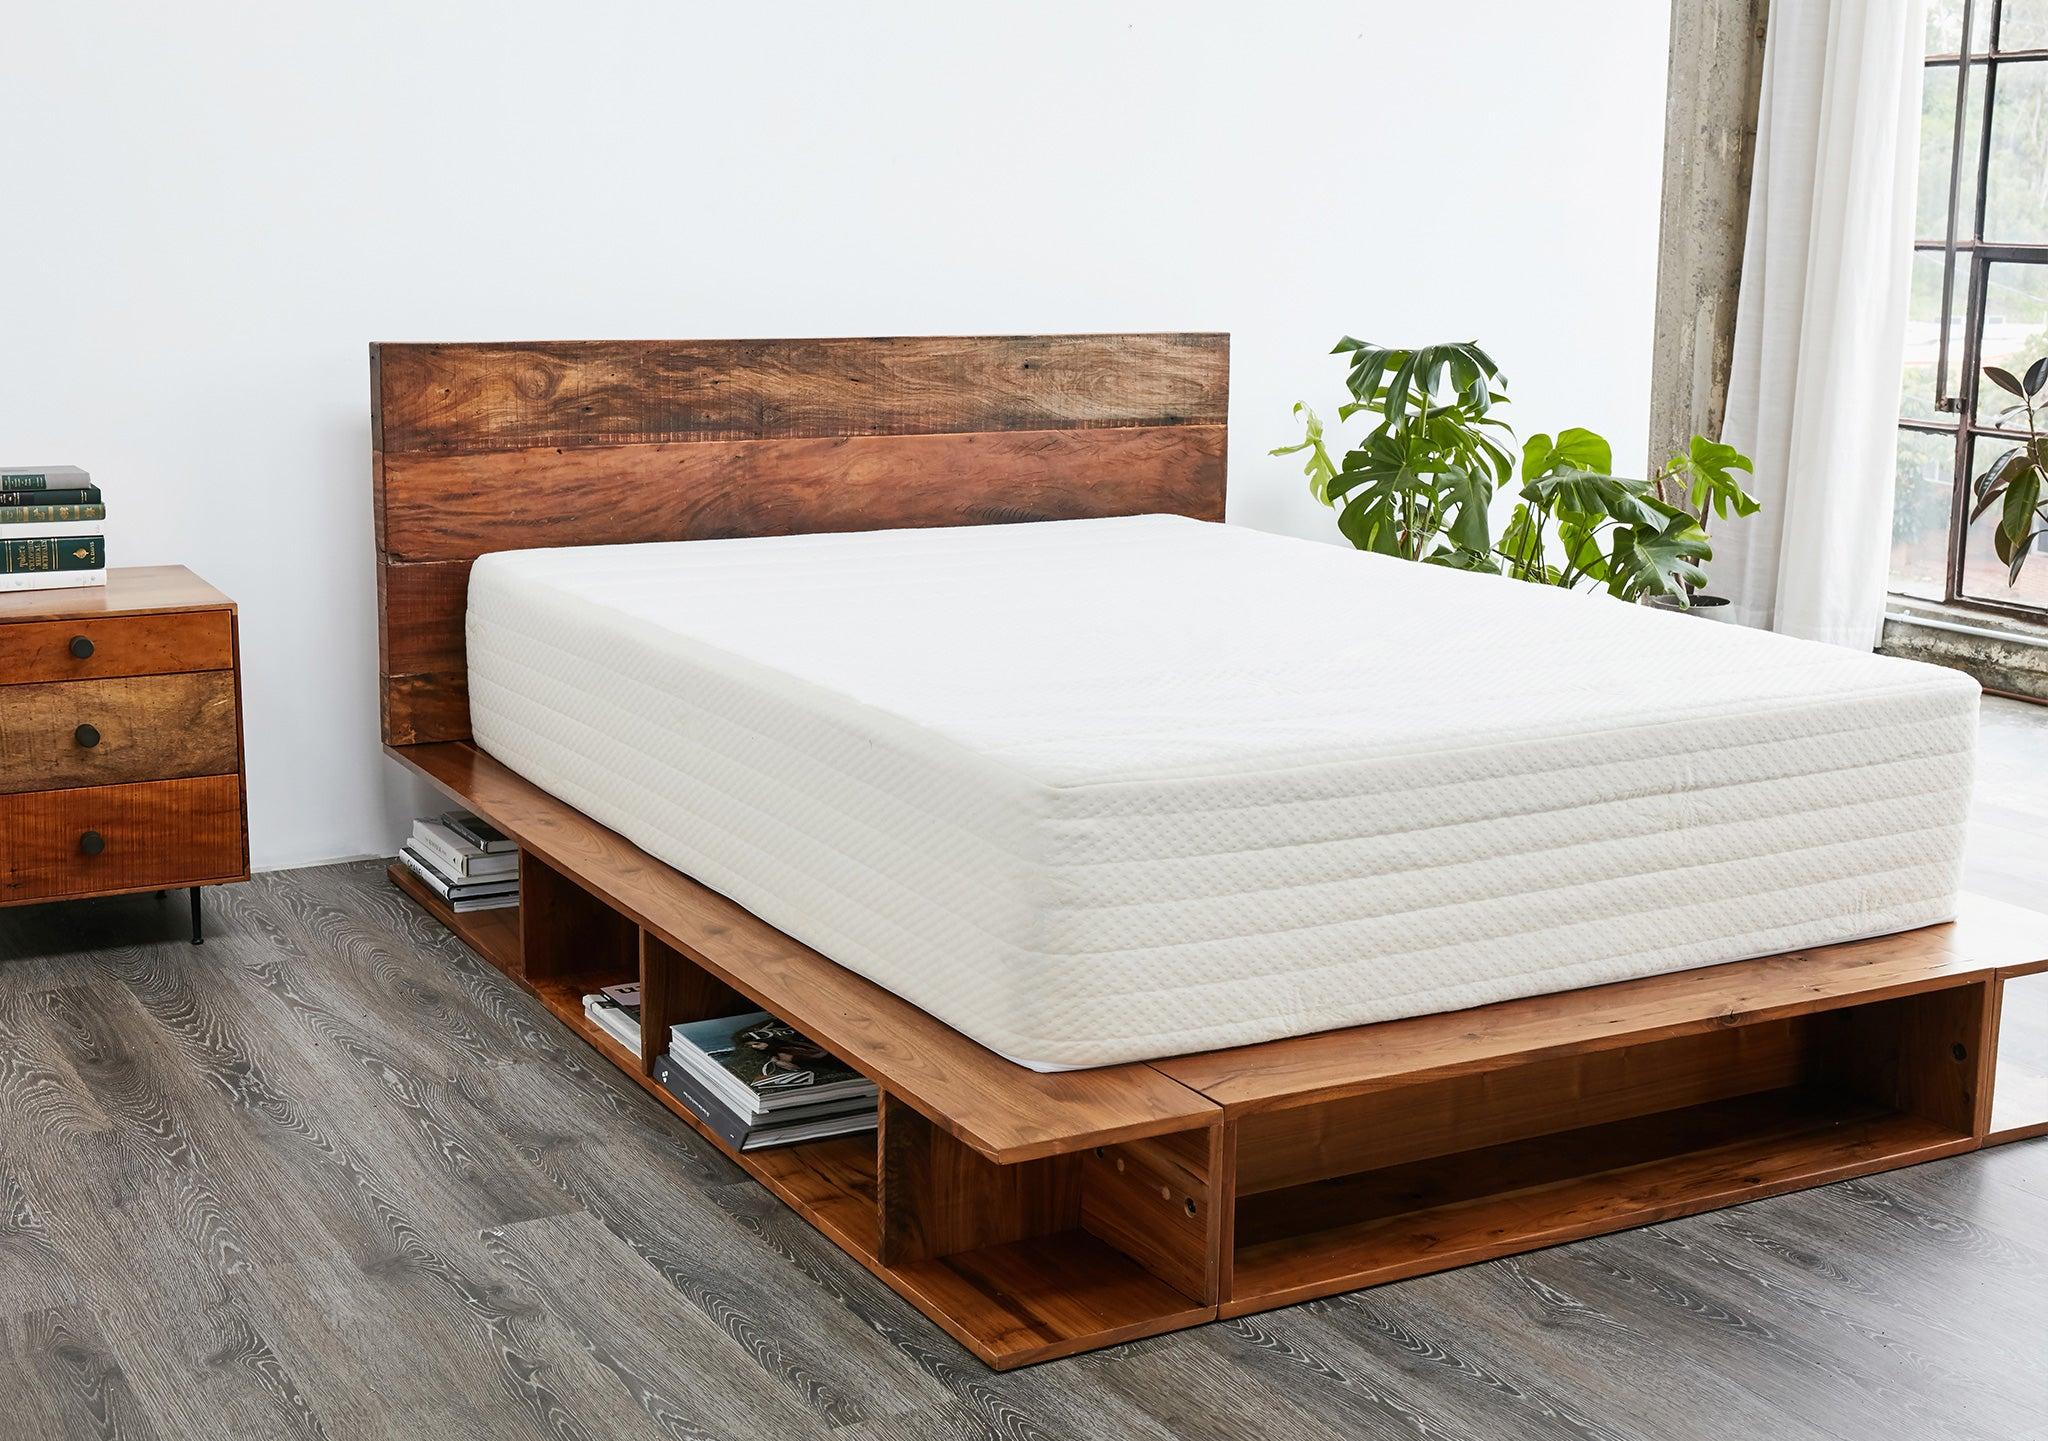 Greenguard Gold Certipur Certified Non Toxic Furniture